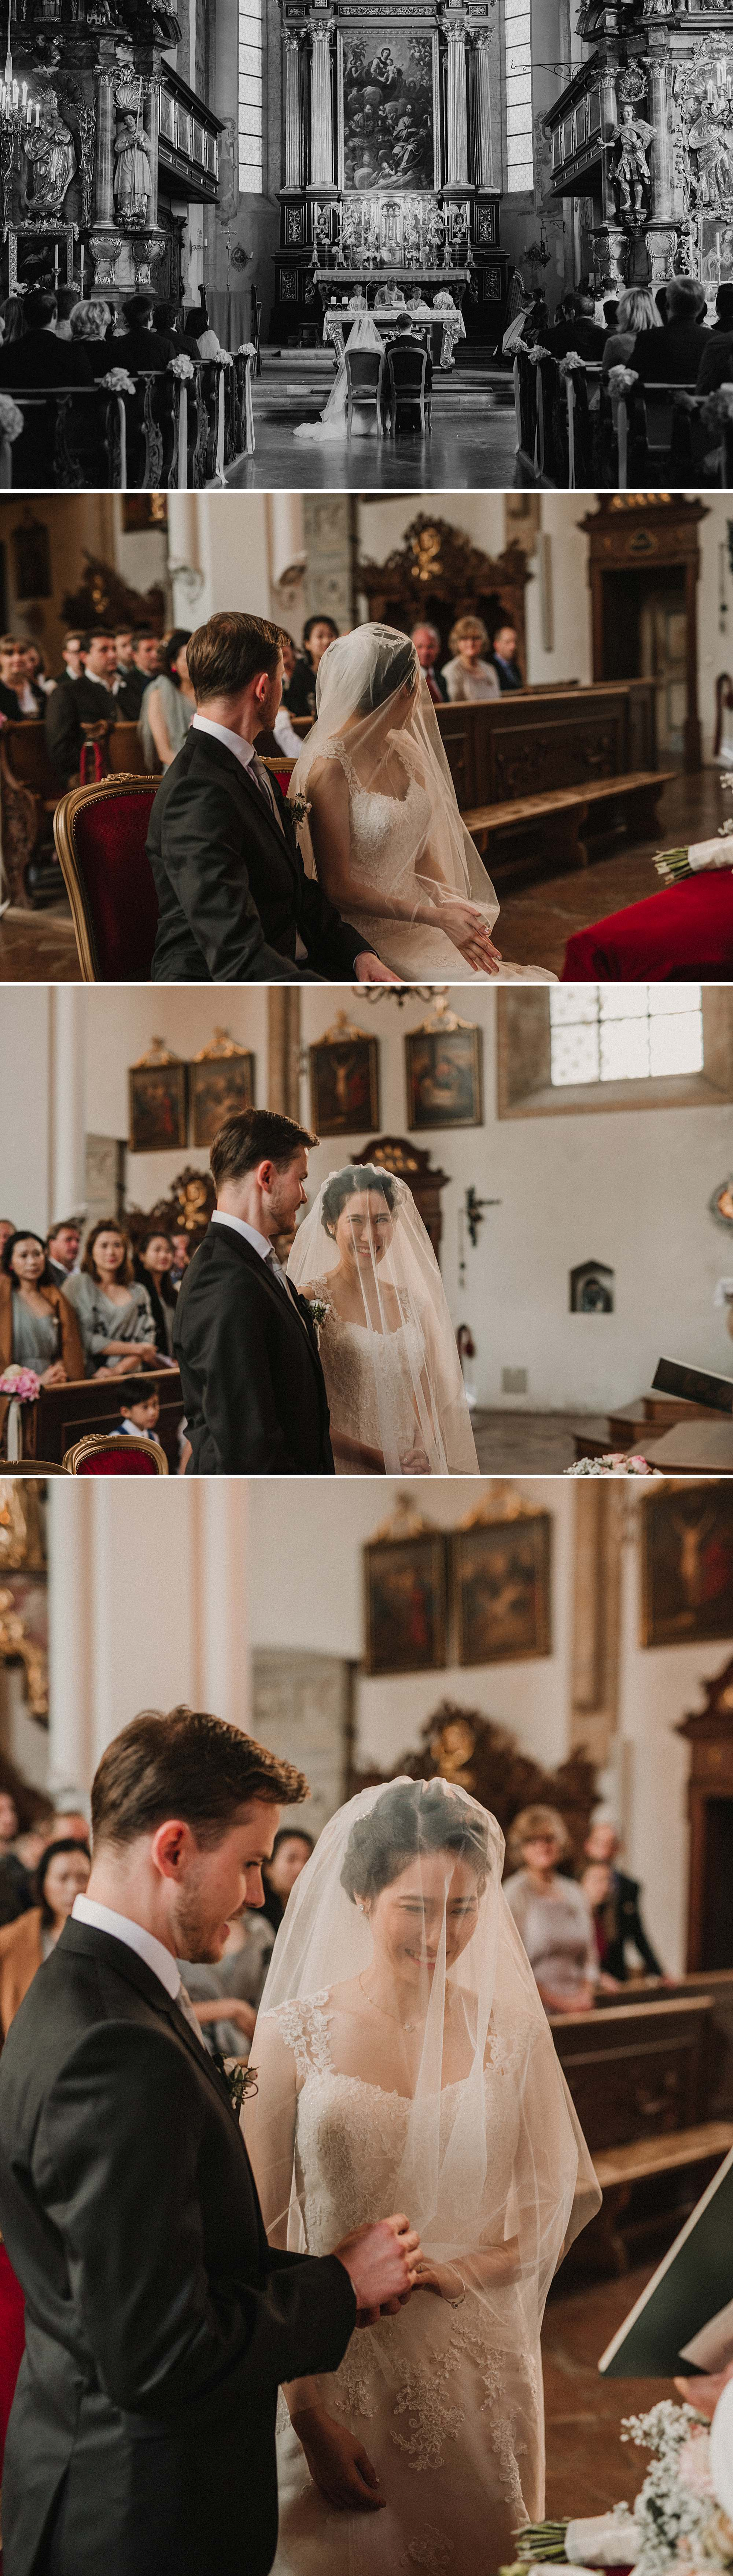 kitzbuehel wedding photographer_0093.jpg